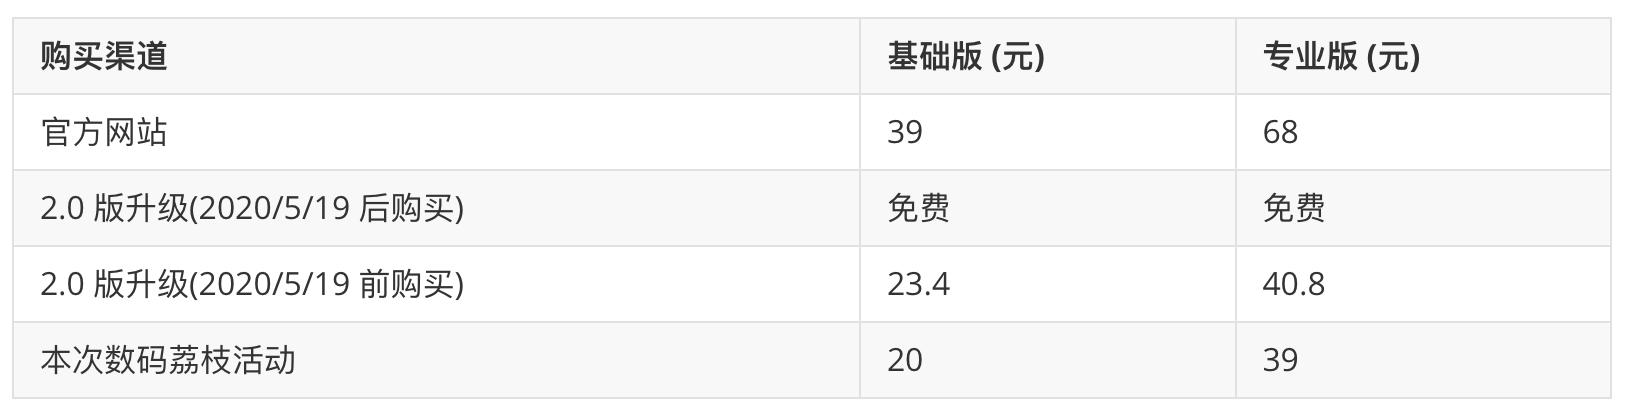 https://asset.droidyue.com/image/lizhi_io/ntfs/chart_1.png